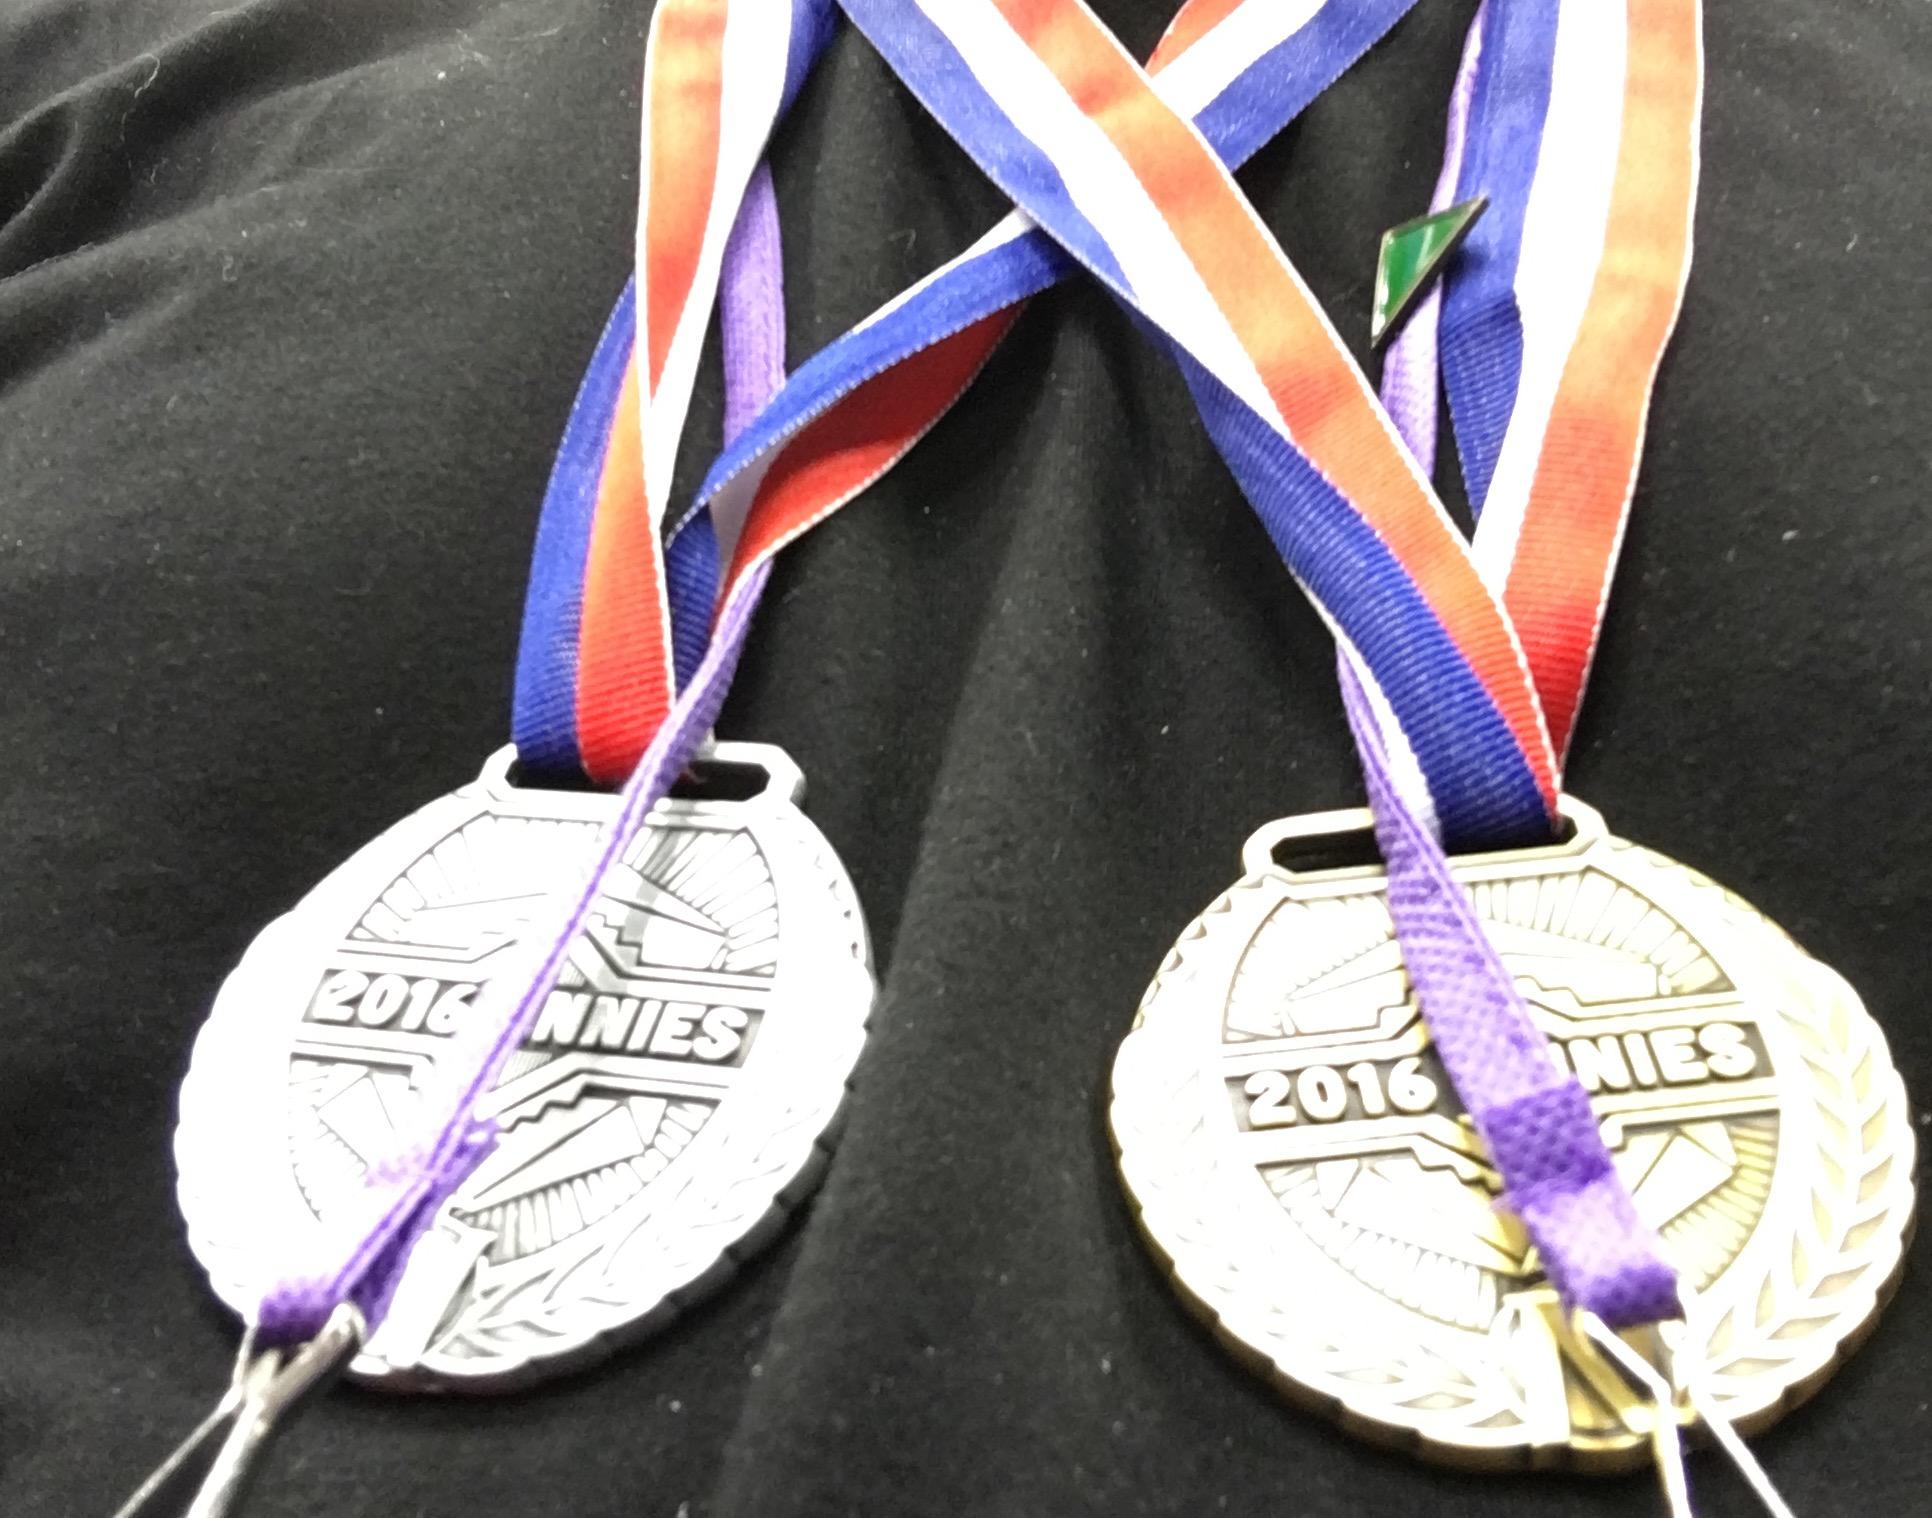 ennie medals